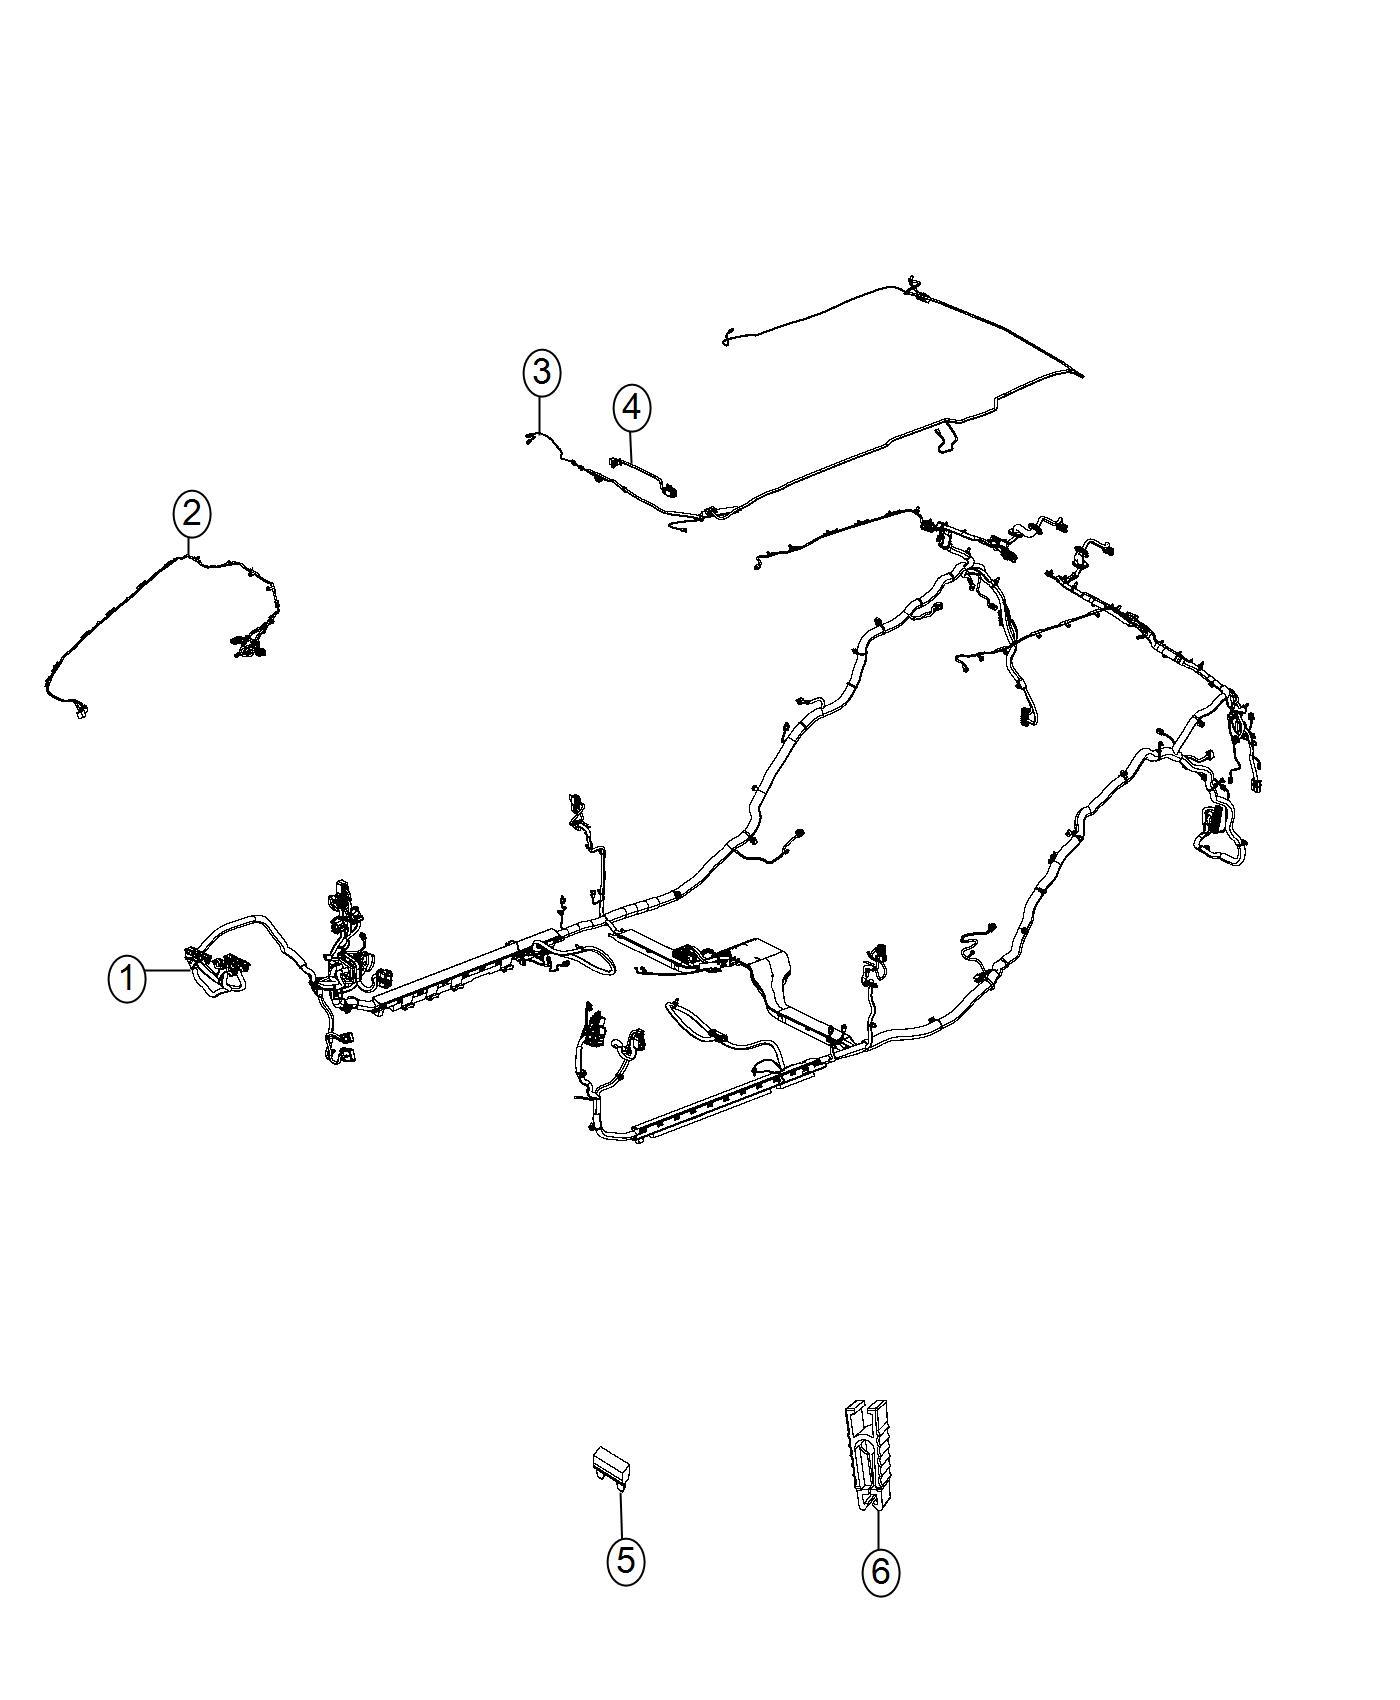 Stop Maxon Liftgate Parts Cart | Wiring Diagram Database on mitsubishi fuso wiring diagram, electrical wiring diagram, power windows wiring diagram, transmission wiring diagram, flatbed wiring diagram, sunroof wiring diagram, instrument panel wiring diagram, door wiring diagram, switches wiring diagram, heated seats wiring diagram, alternator wiring diagram, reading wiring diagram, 4-way connector wiring diagram, fender wiring diagram, center console wiring diagram, light wiring diagram, locks wiring diagram, engine wiring diagram, mirror wiring diagram, compressor wiring diagram,